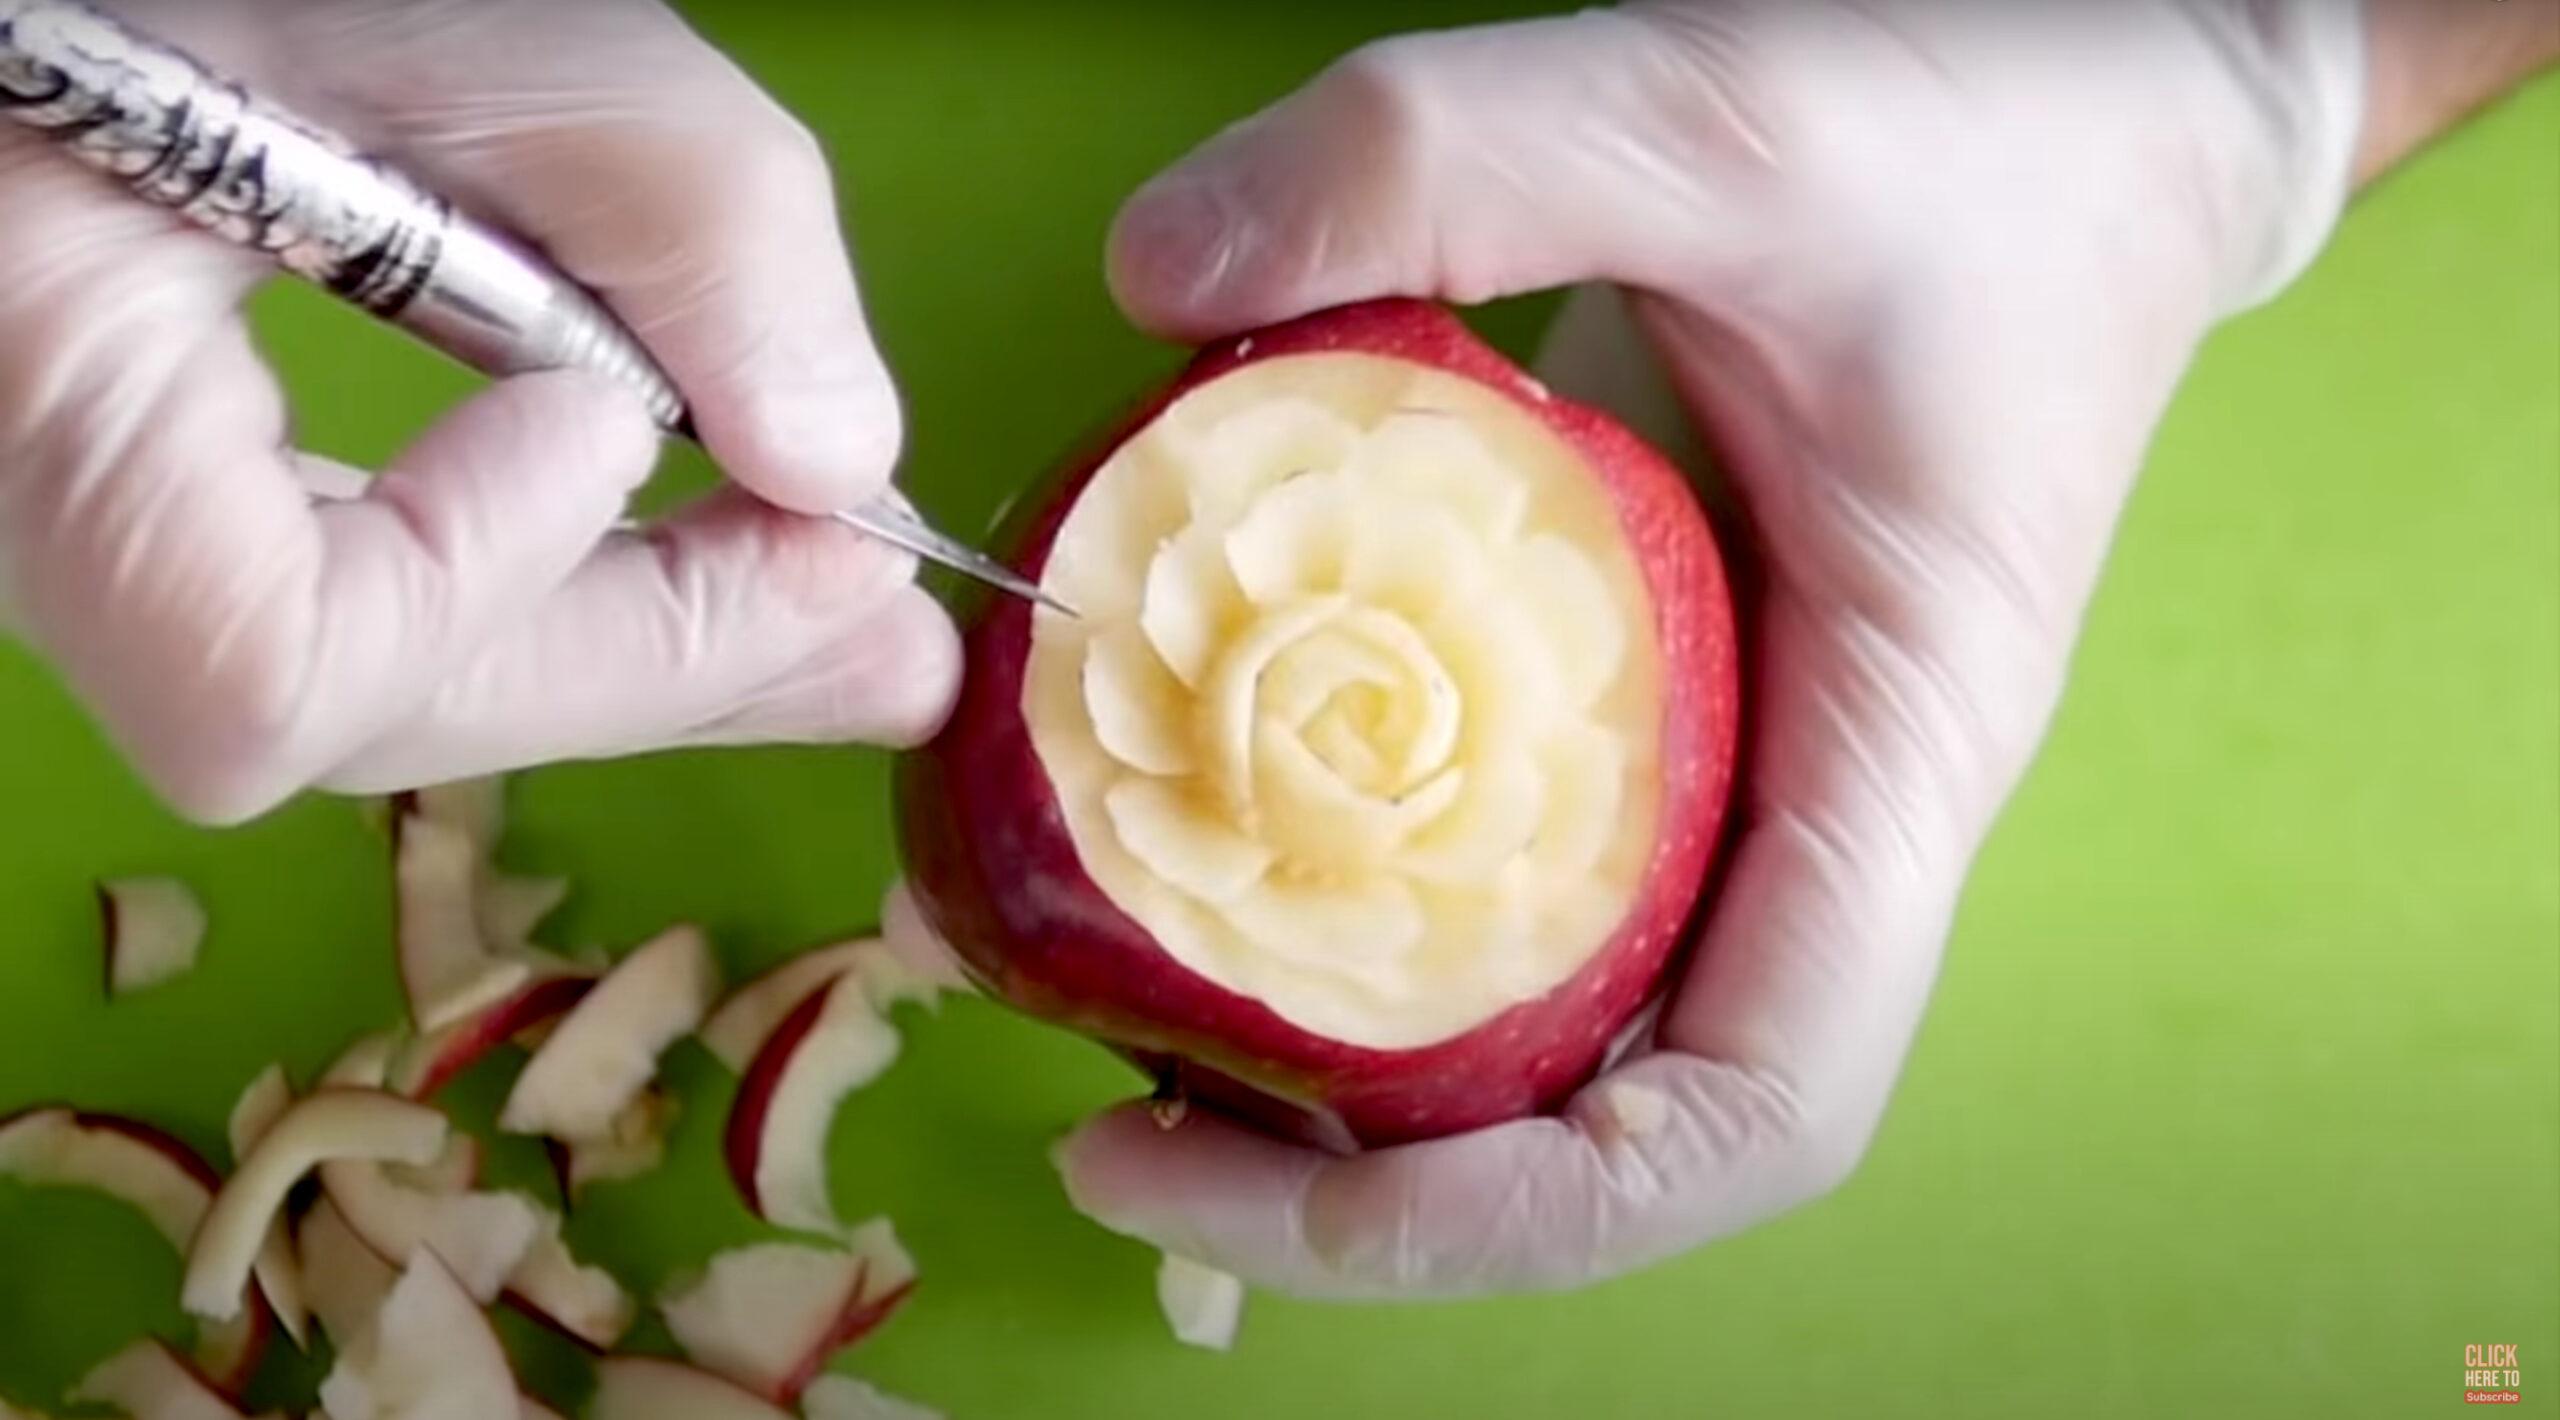 Watch this expert apple sculptor create juicy delights